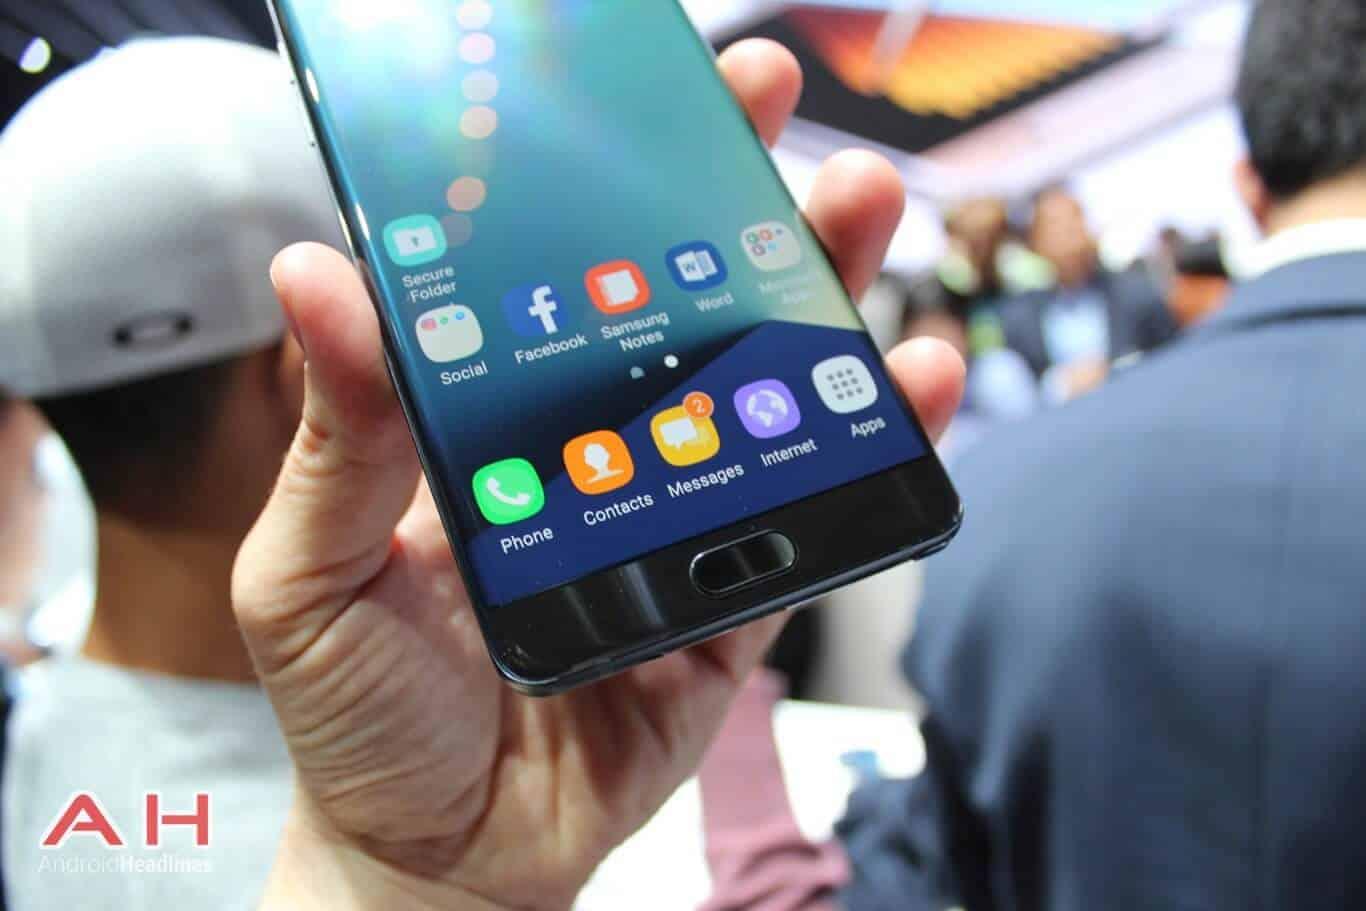 Galaxy Note 7 NS AH 7